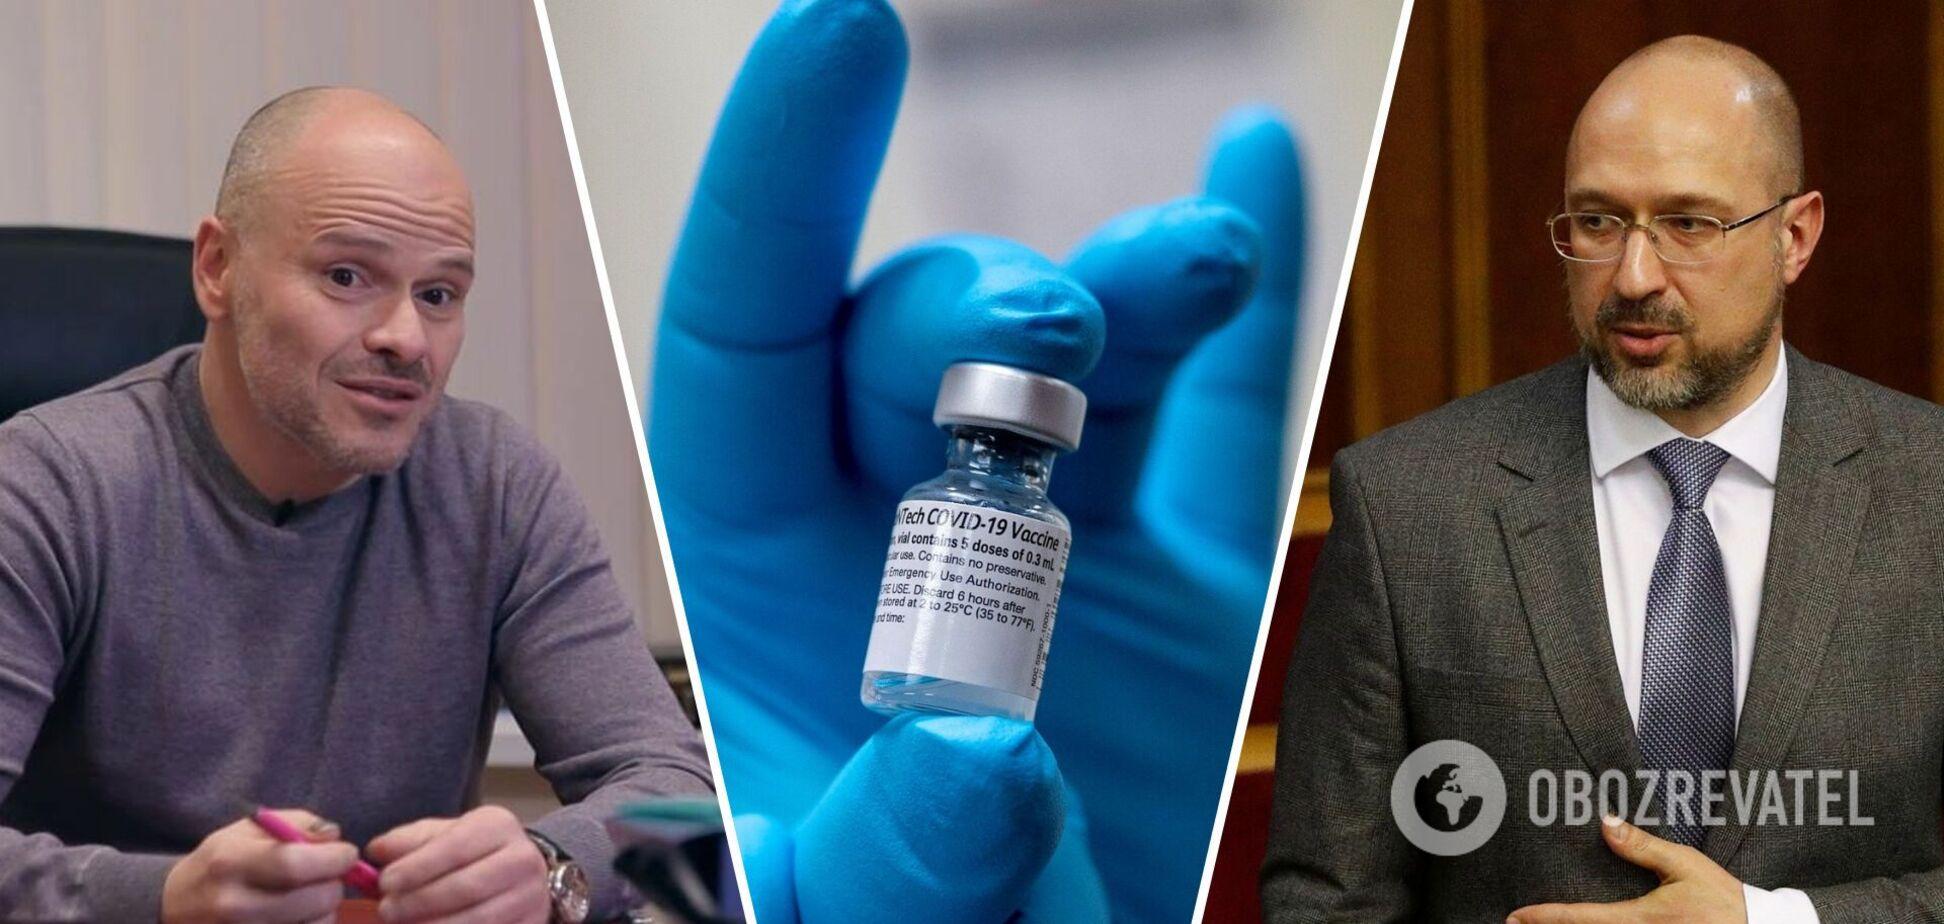 Вакцина для избранных? Как Украина попала в скандал из-за COVID-19